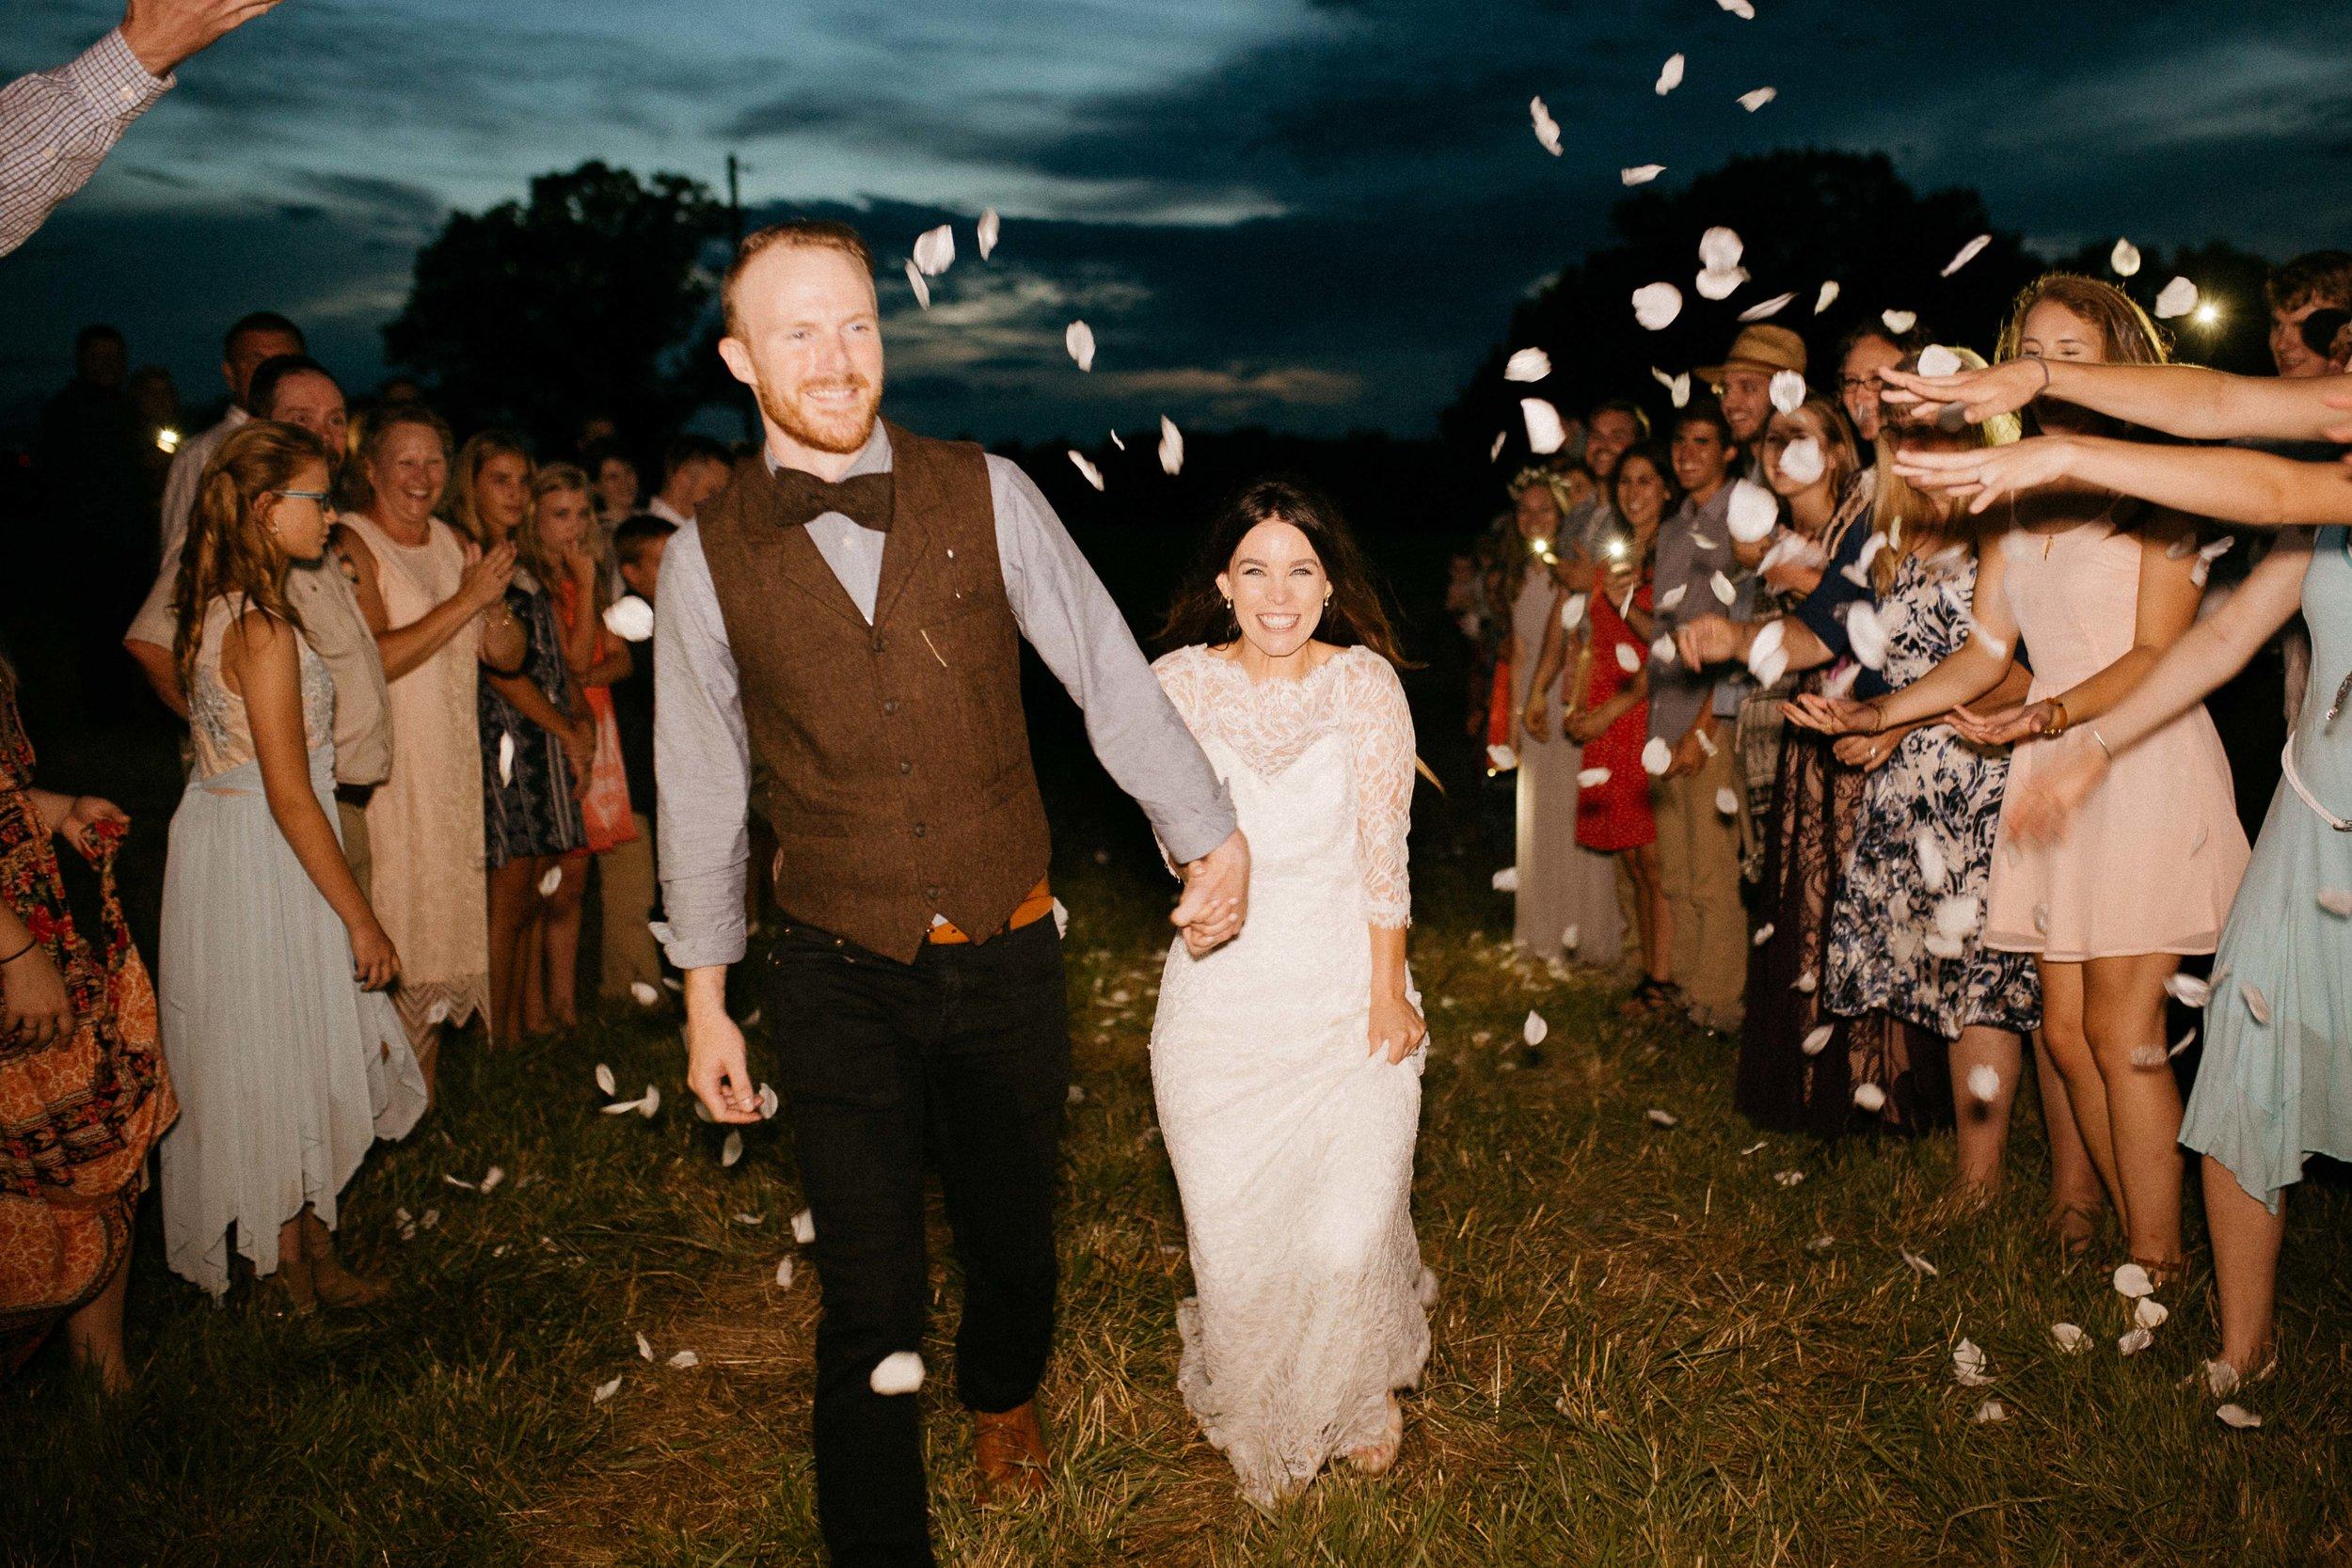 memphis tn wedding-78.jpg